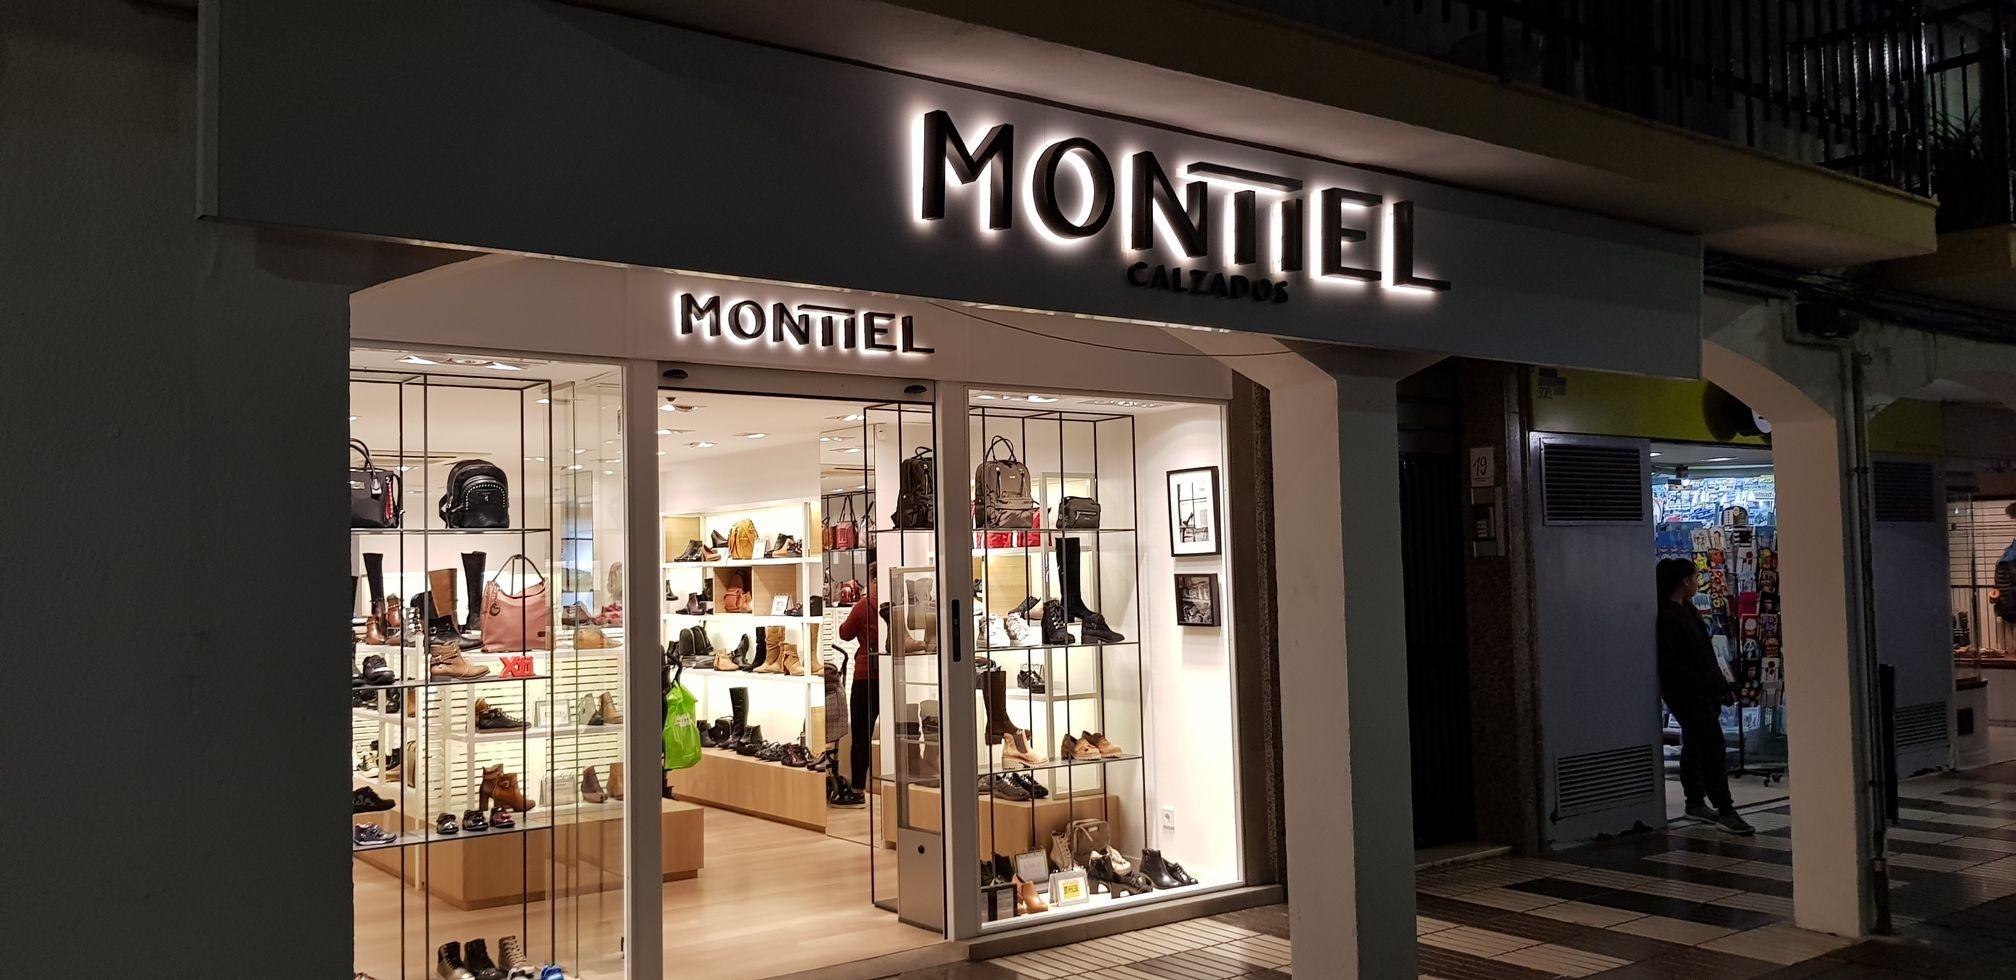 Calzados Montiel - Altea - Av. Jaime I, 19